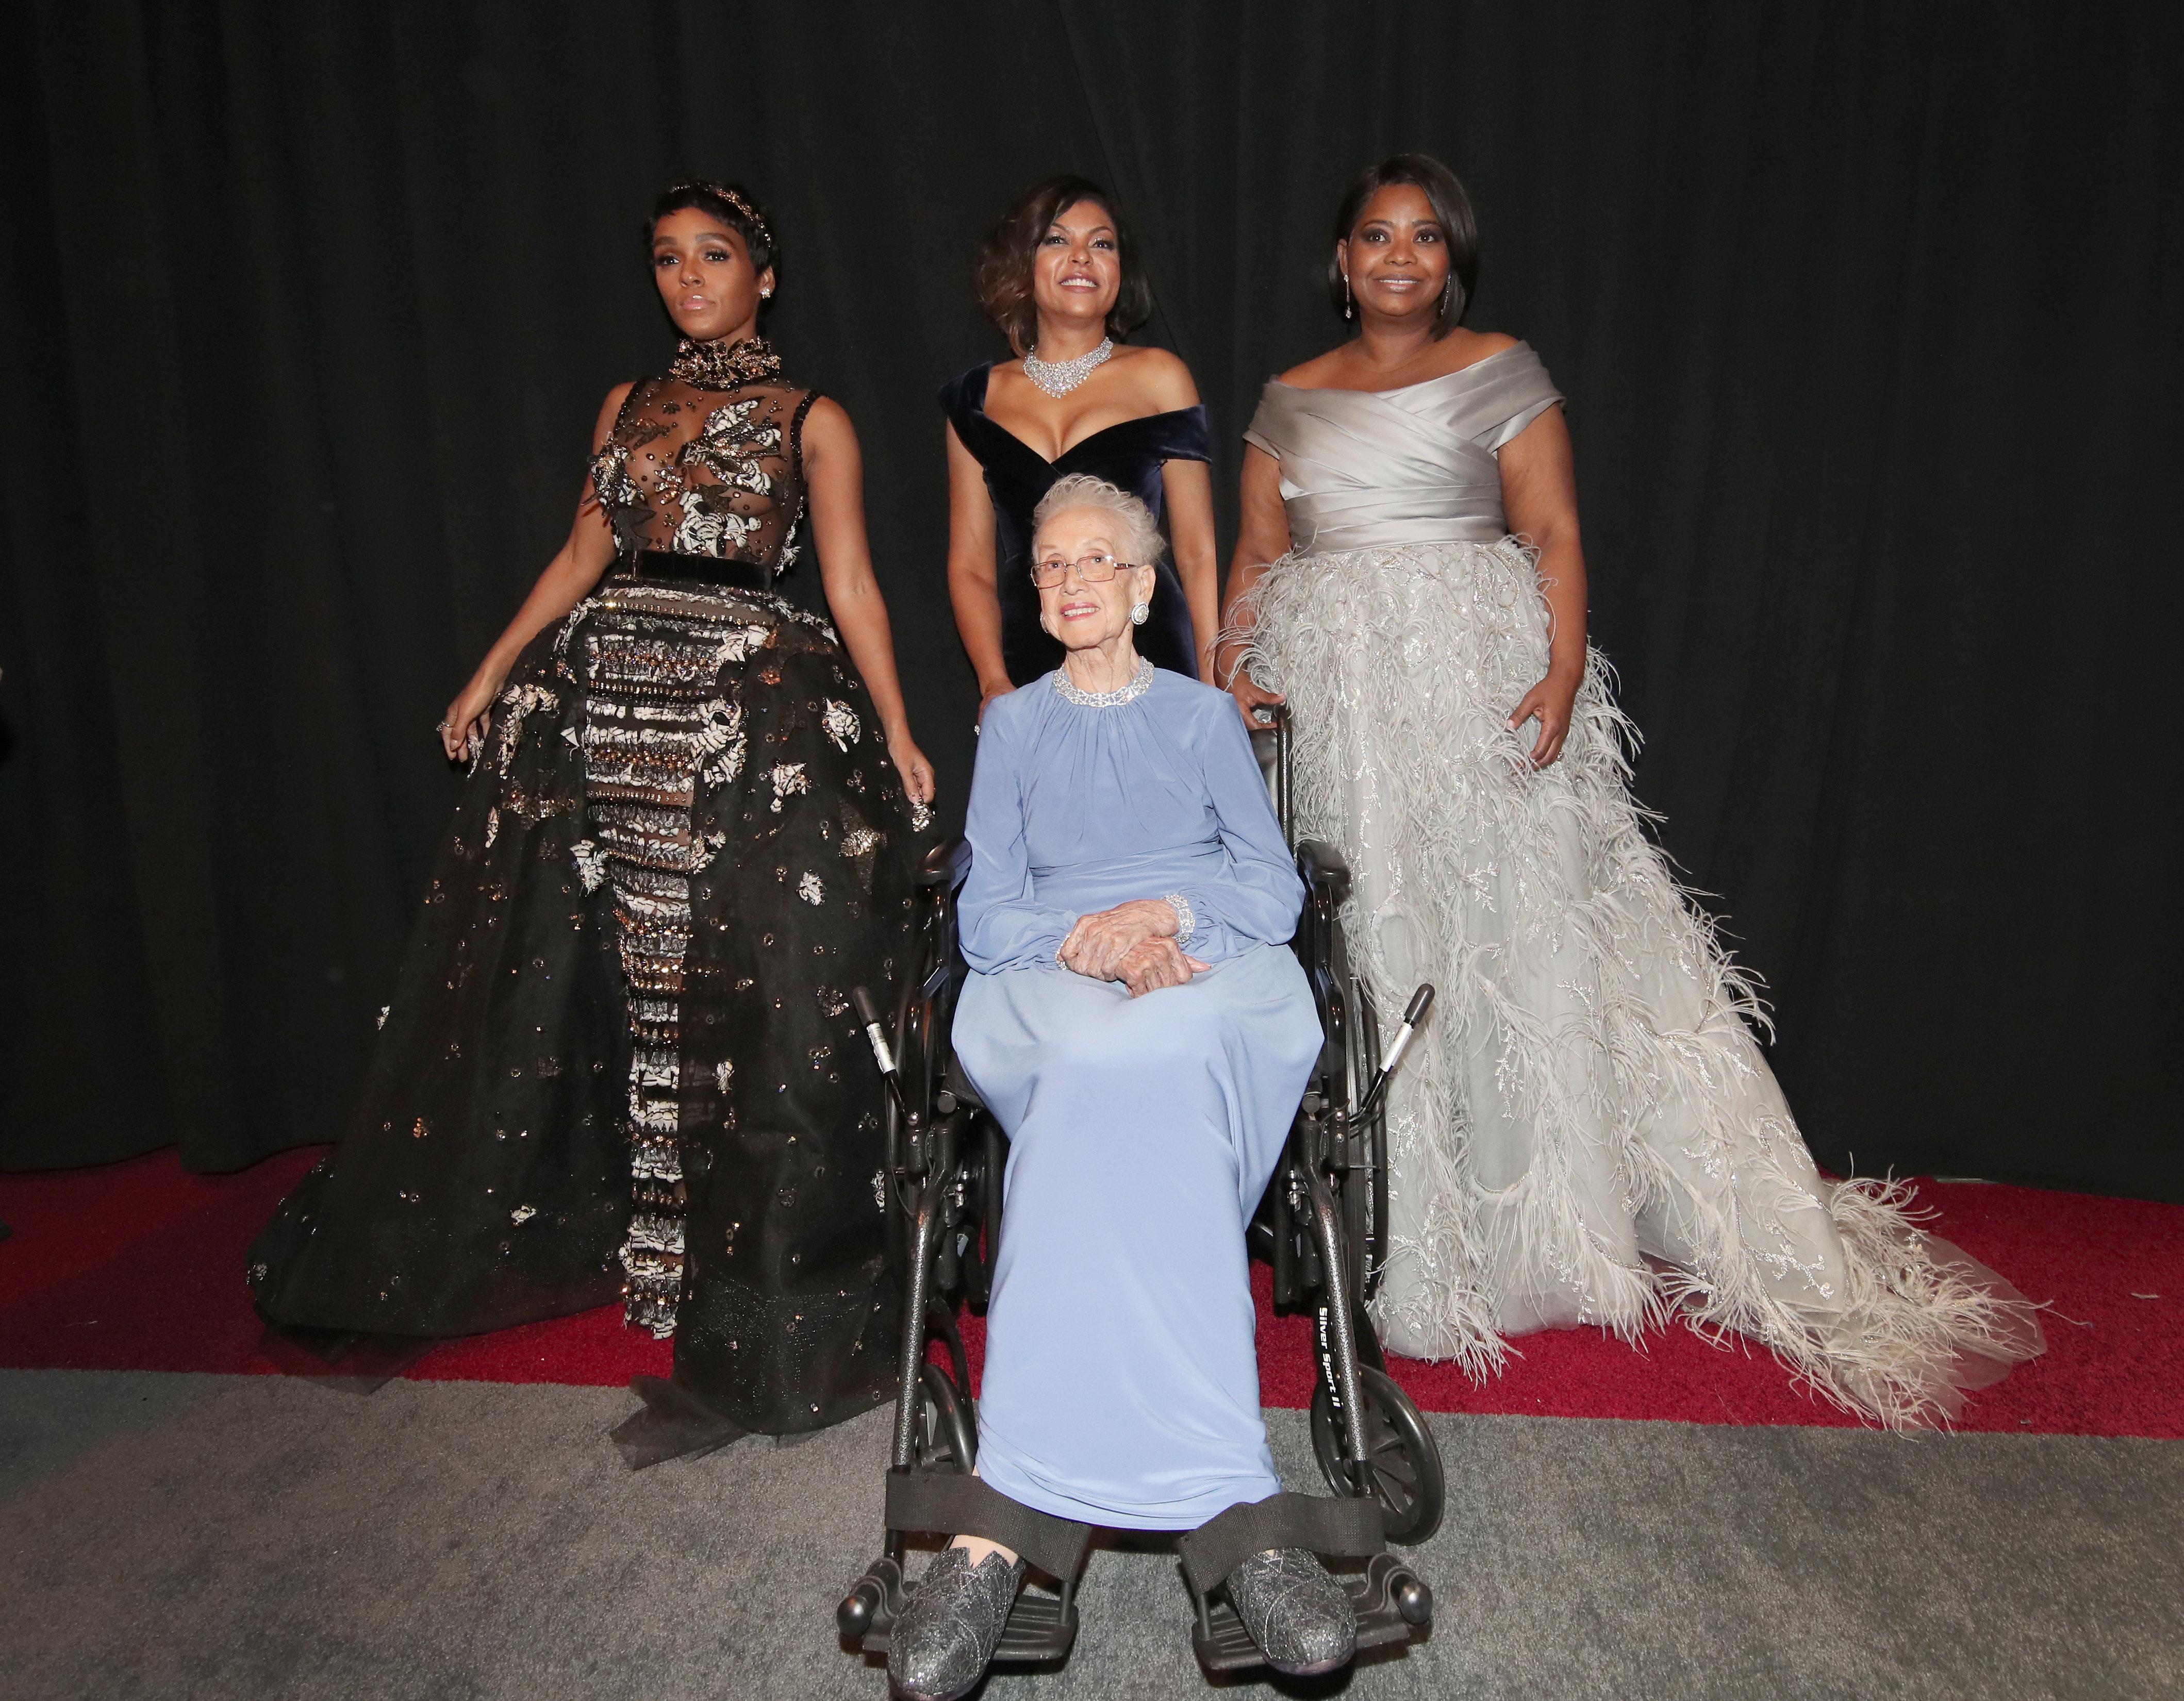 NASA mathematician Katherine Johnson and actors Taraji P. Henson, Octavia Spencer and Janelle Monae pose backstage during the